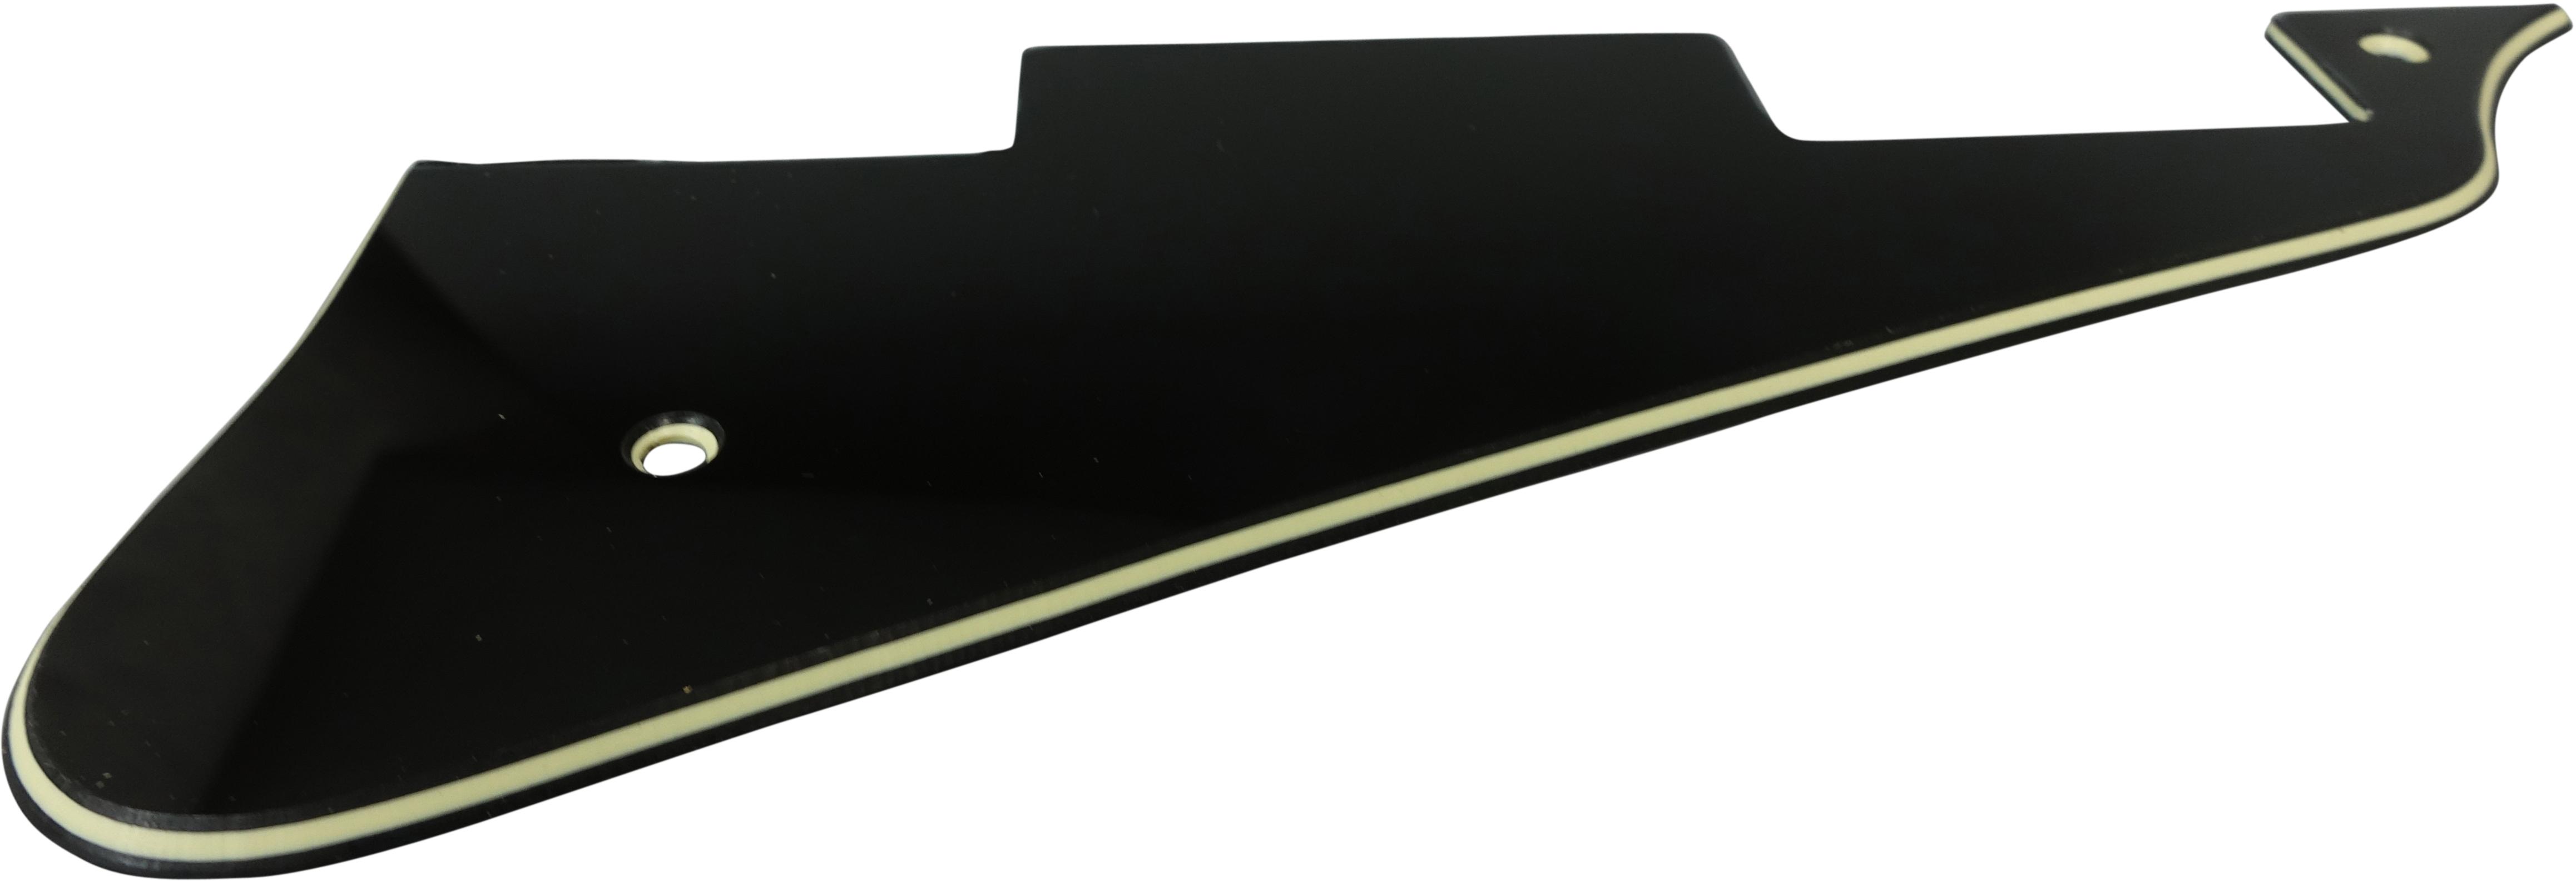 Toronzo Pickguard LP-3PLY-Black Cream